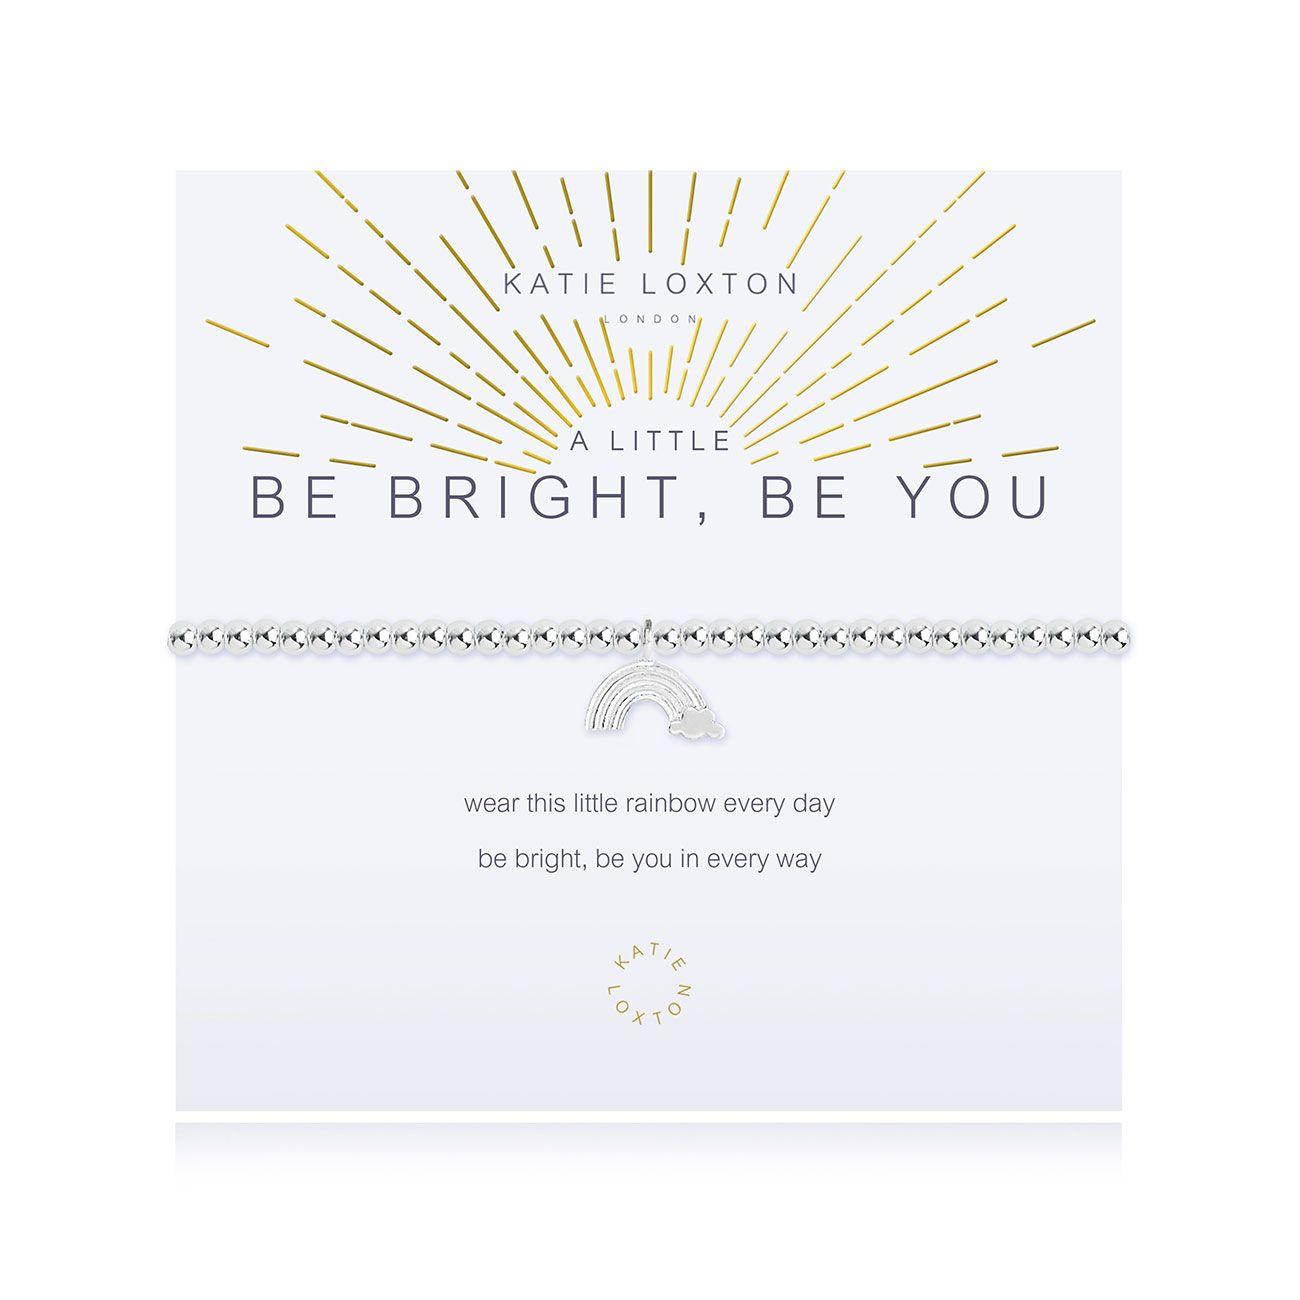 Katie Loxton -  A Little Be Bright, Be You Bracelet